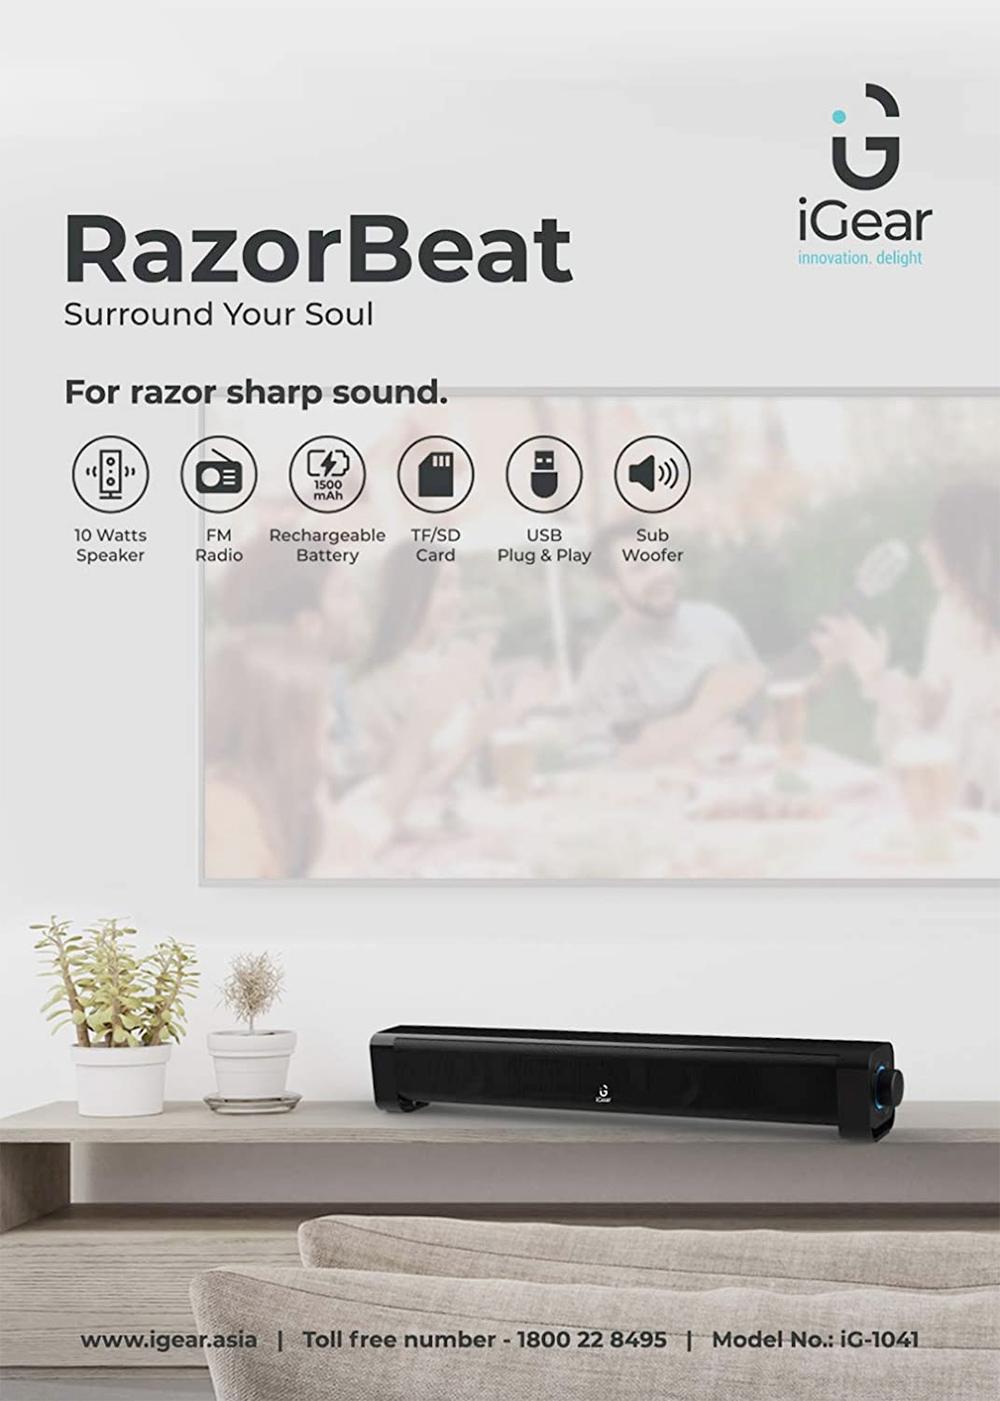 iGear RazorBeat